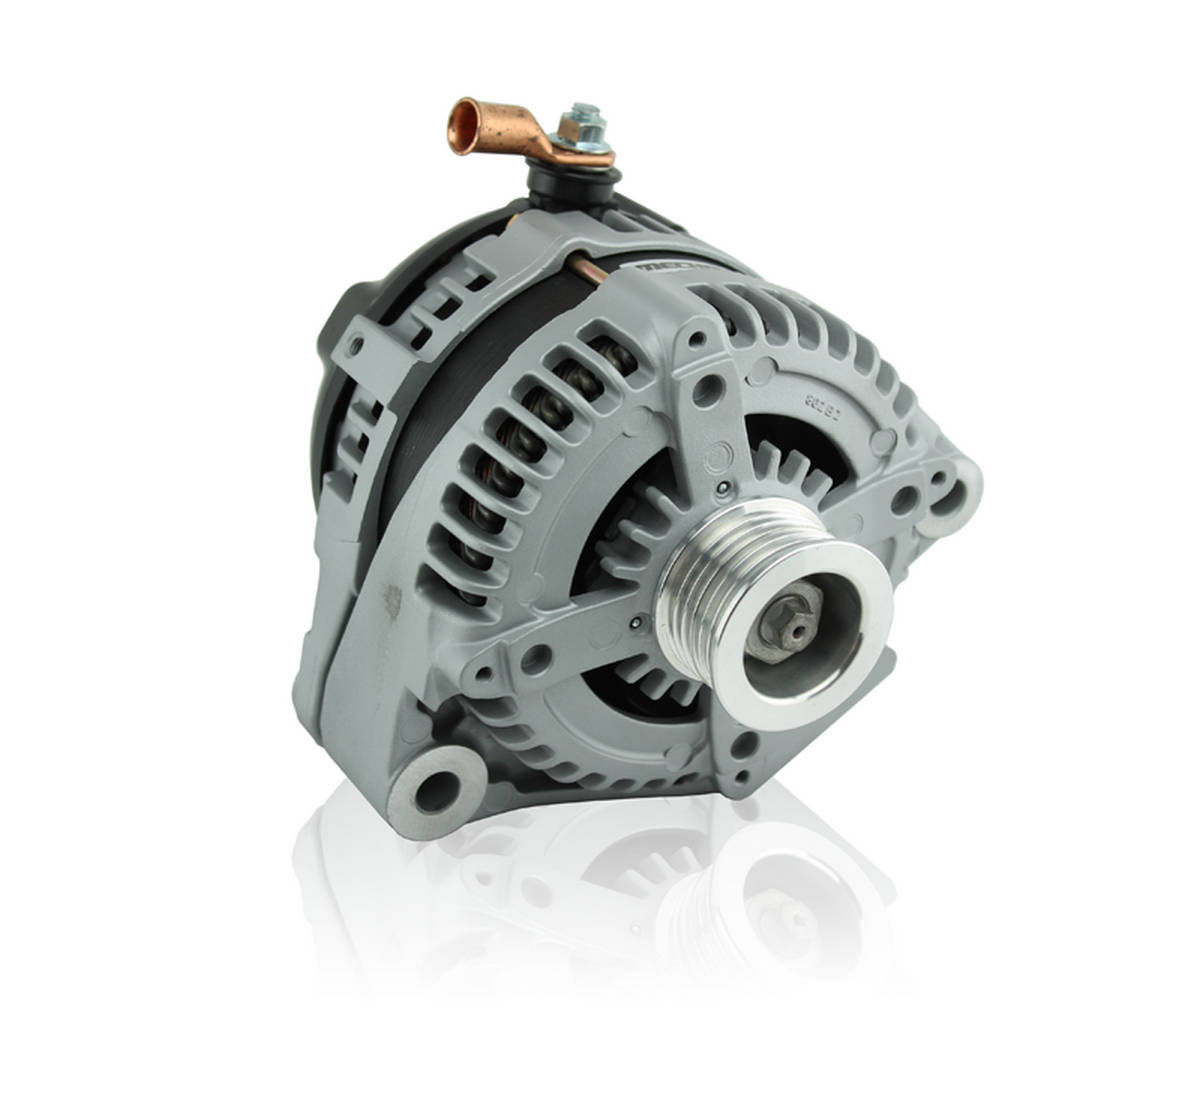 S Series 6 Phase 170 amp Racing Alternator